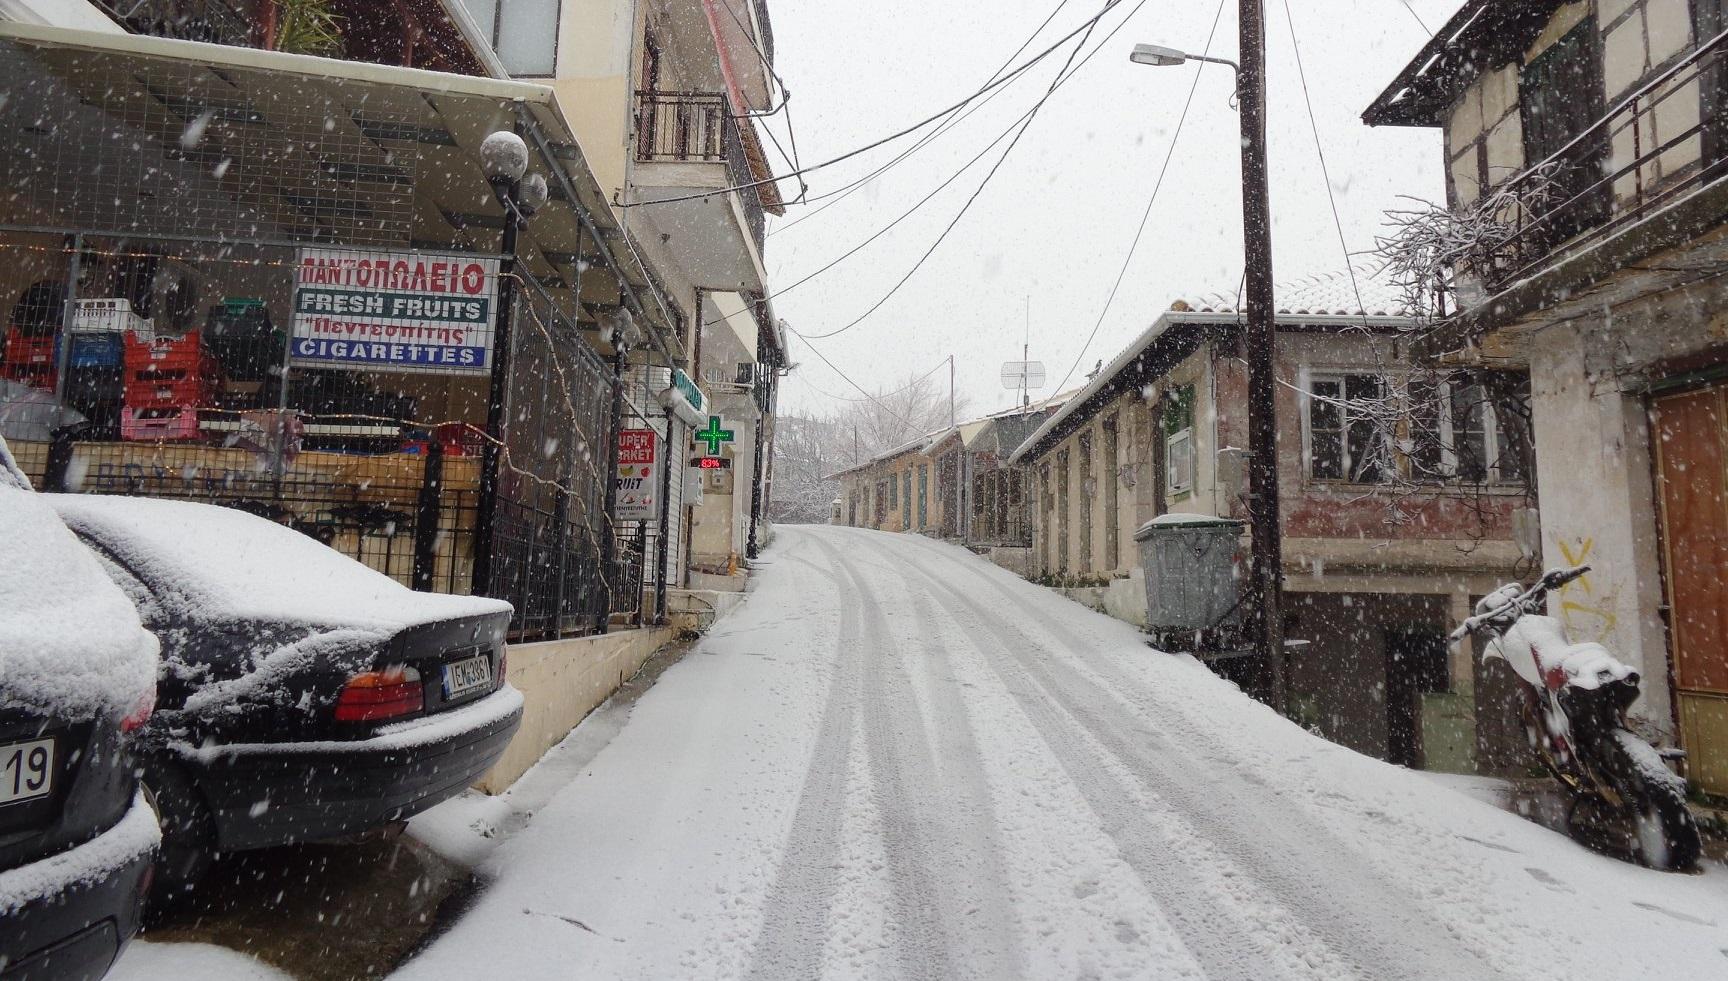 1_xionia_Agios_Petros